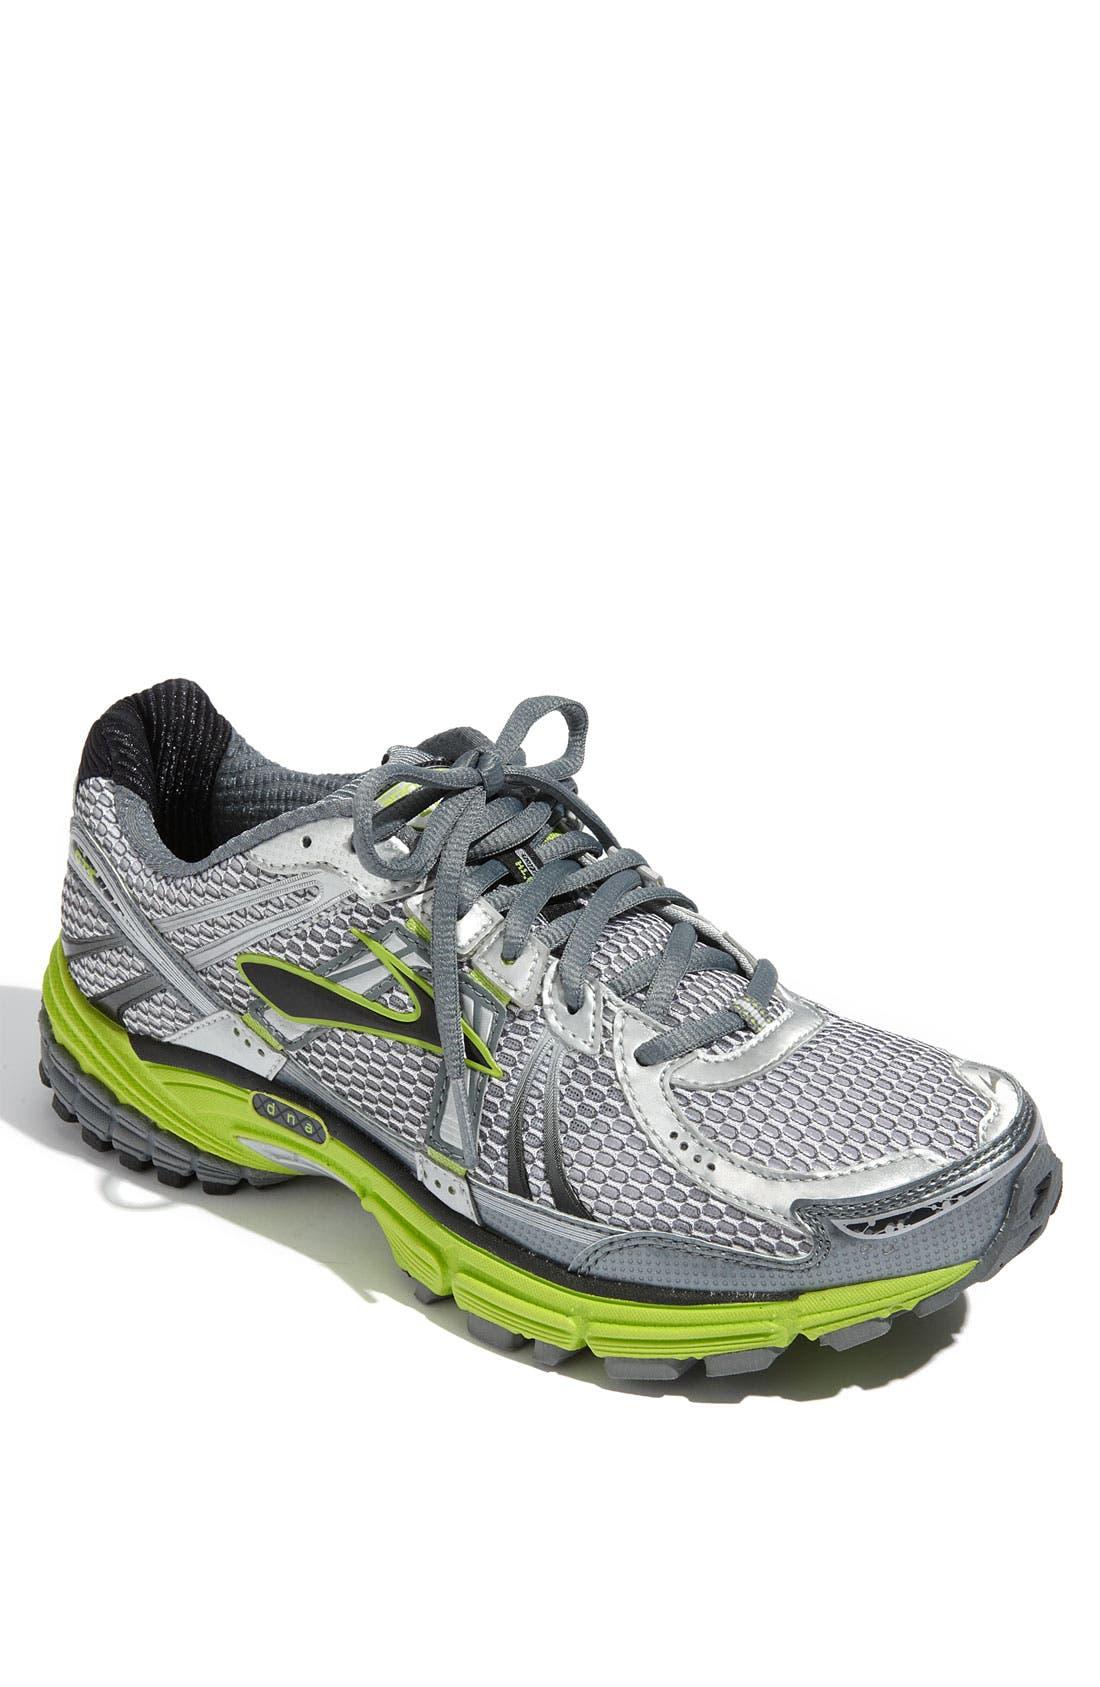 Main Image - Brooks 'Adrenaline GTS 12' Running Shoe (Men)